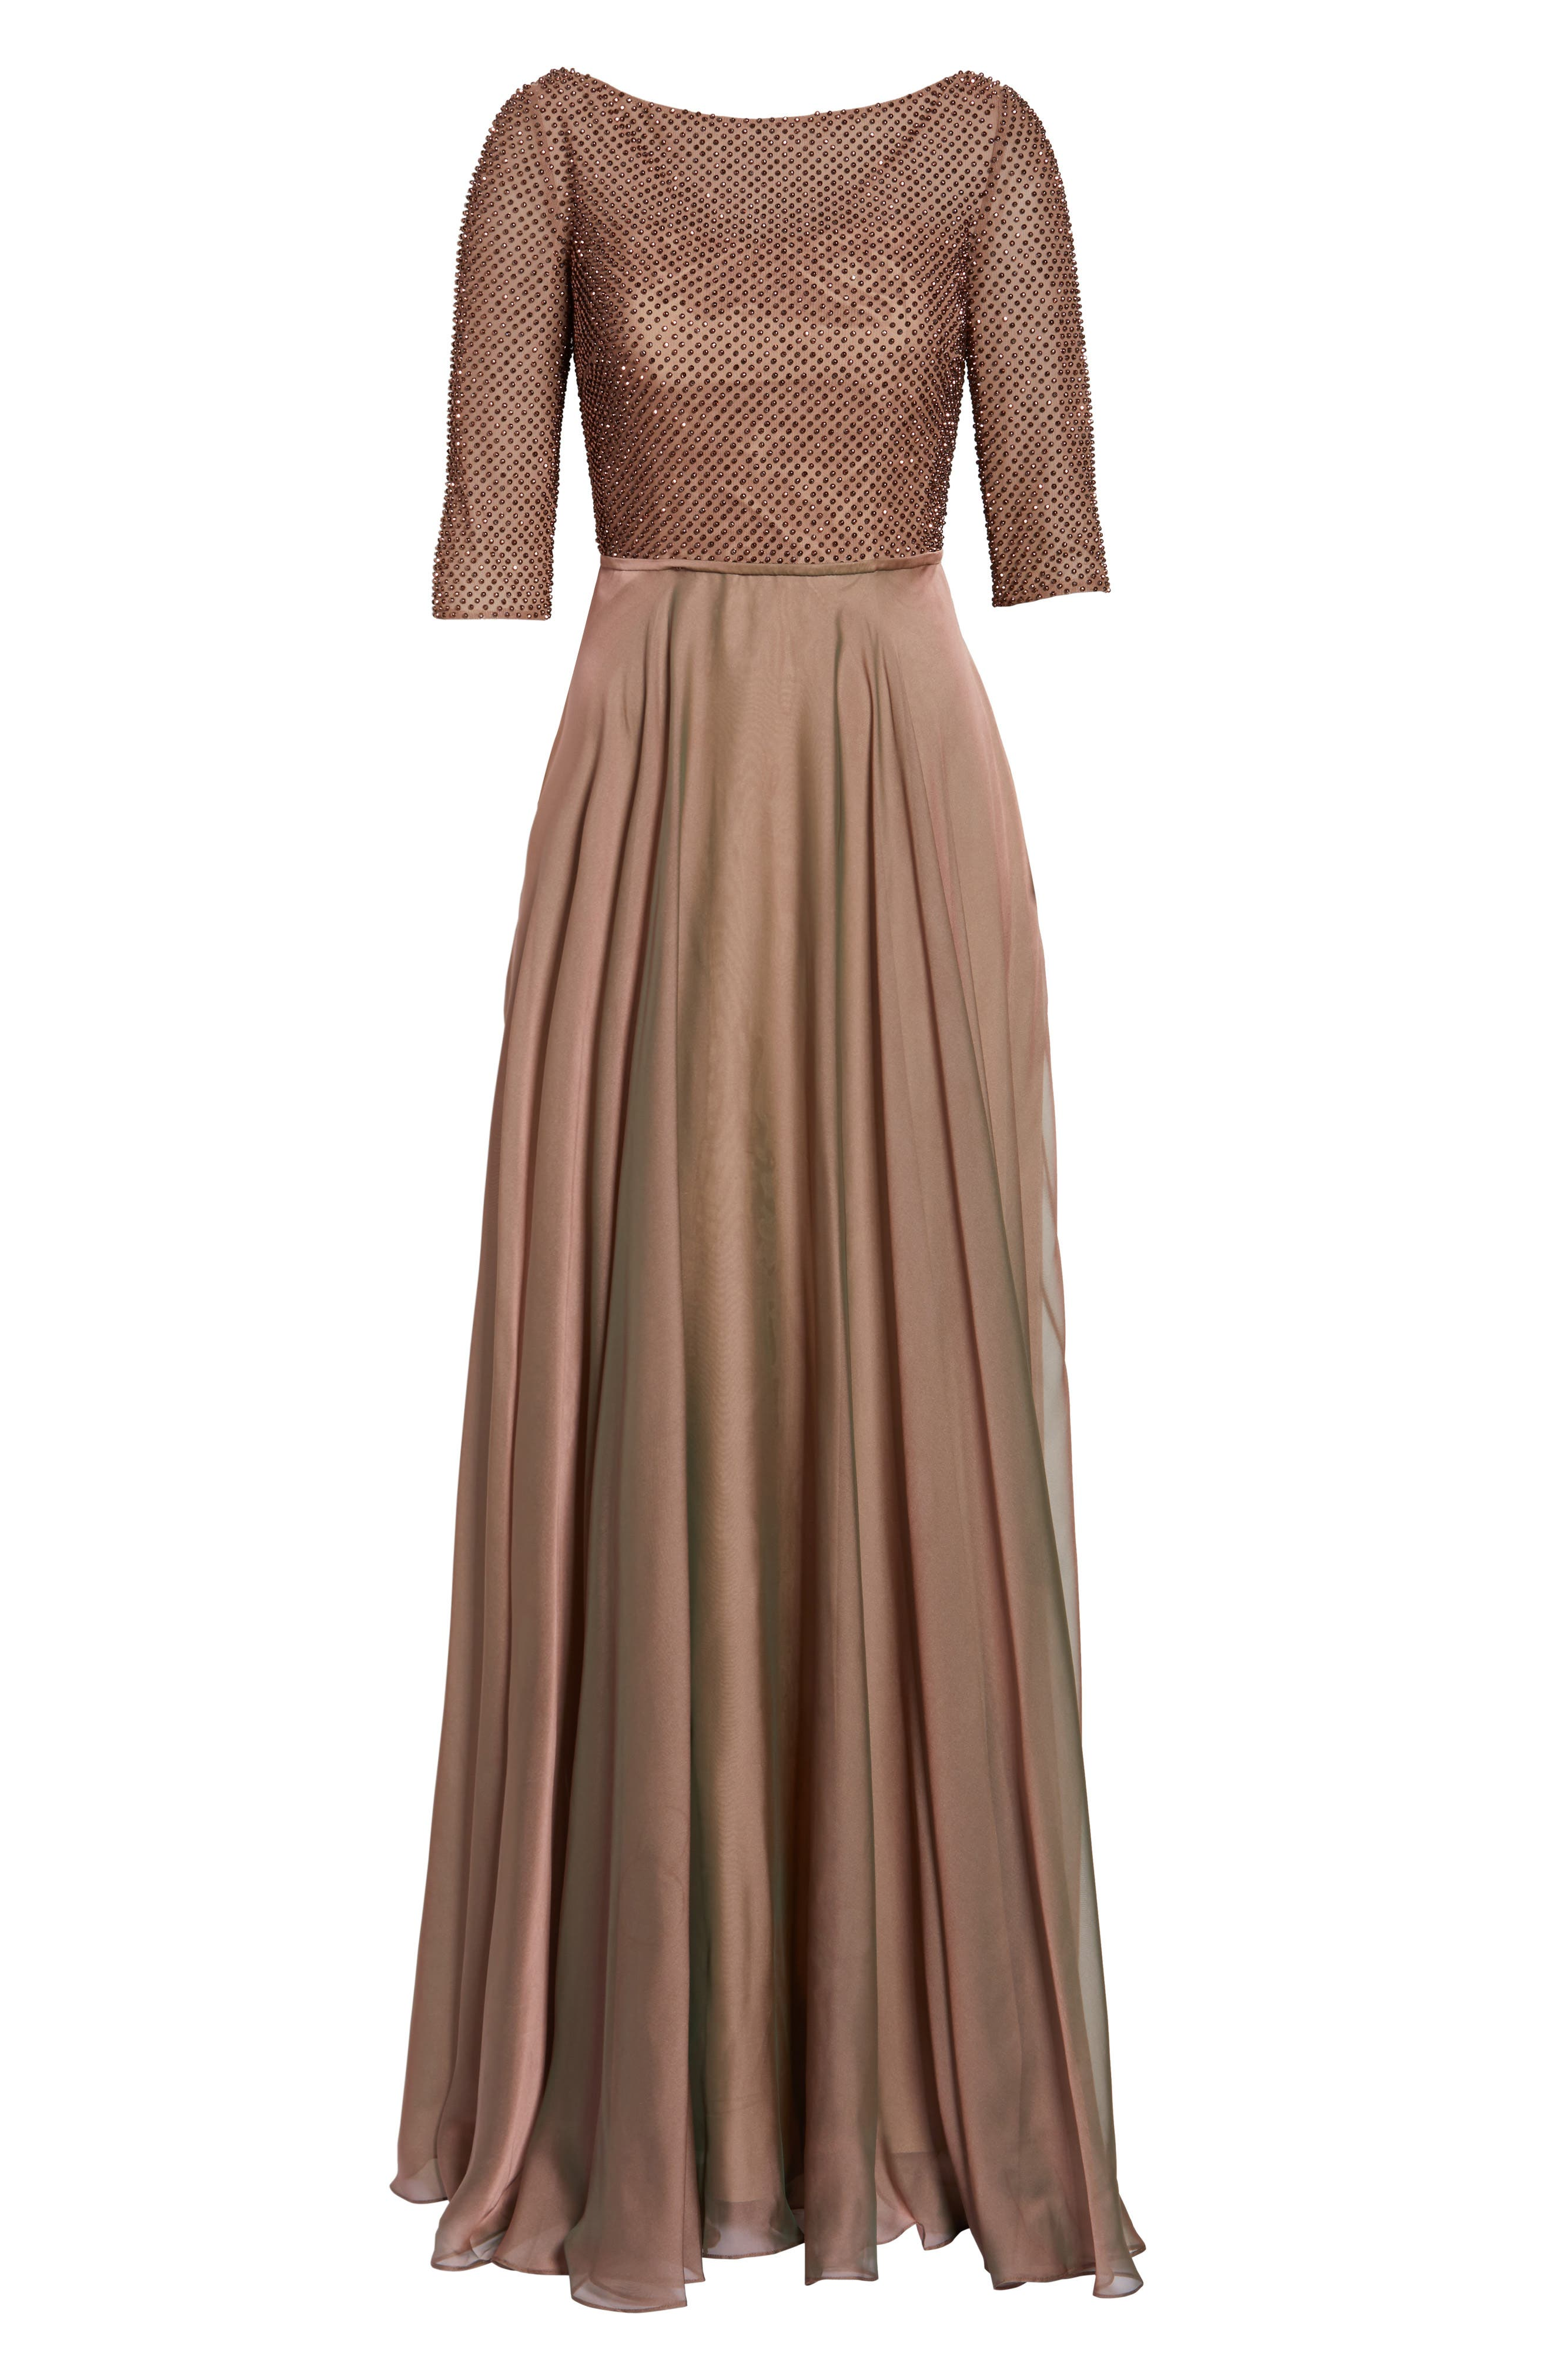 LA FEMME, Embellished Bodice Gown, Alternate thumbnail 6, color, COCOA